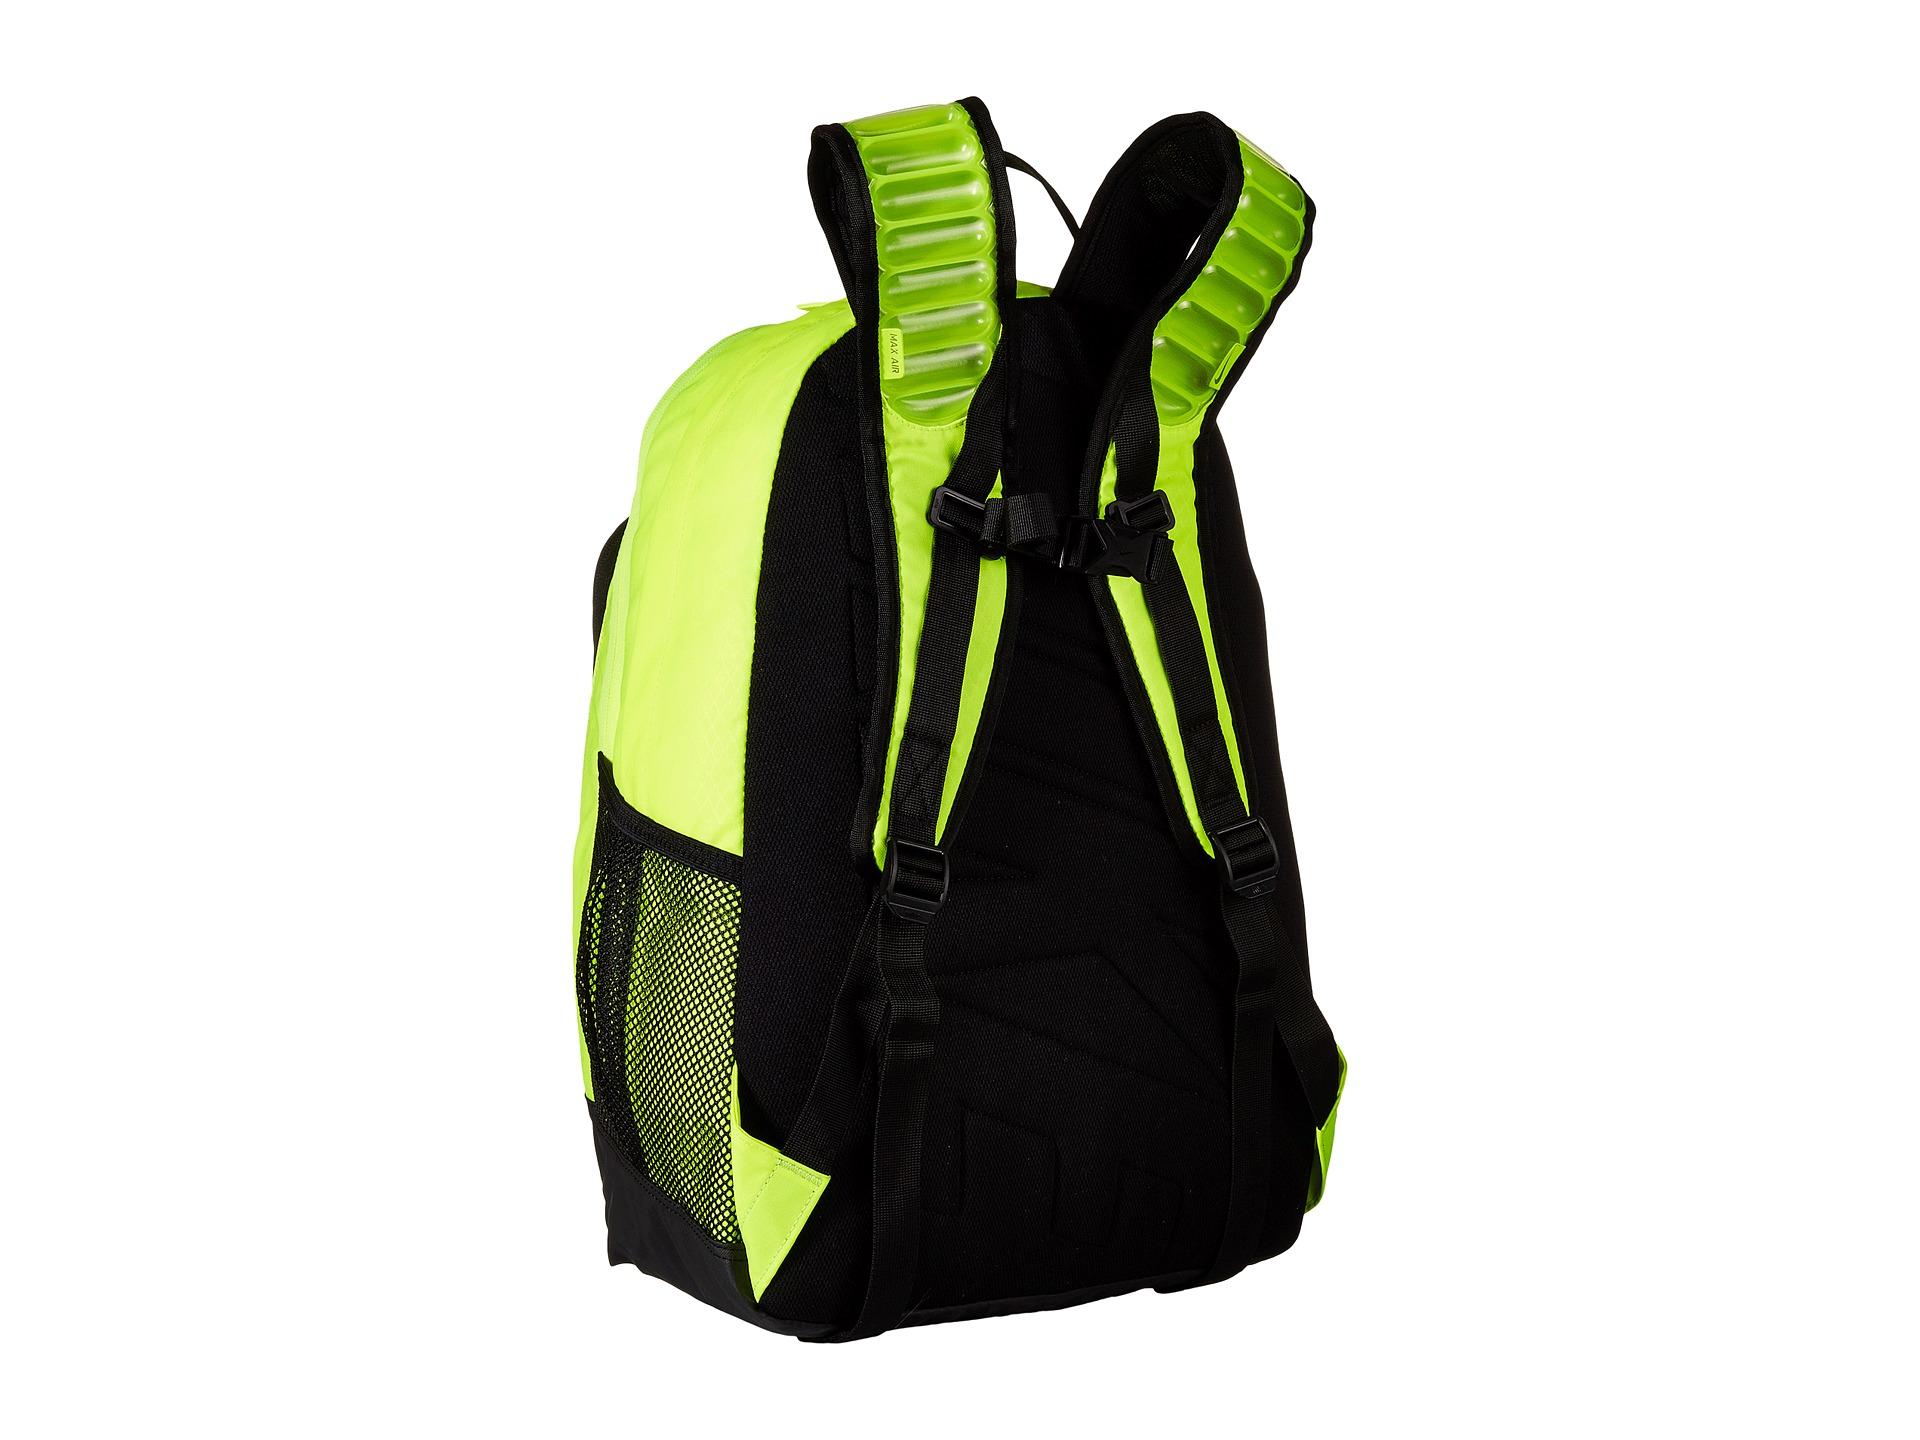 a1701fd0aba Nike Vapor Max Air Backpack Gamma Blue - Bagsandtravel.info